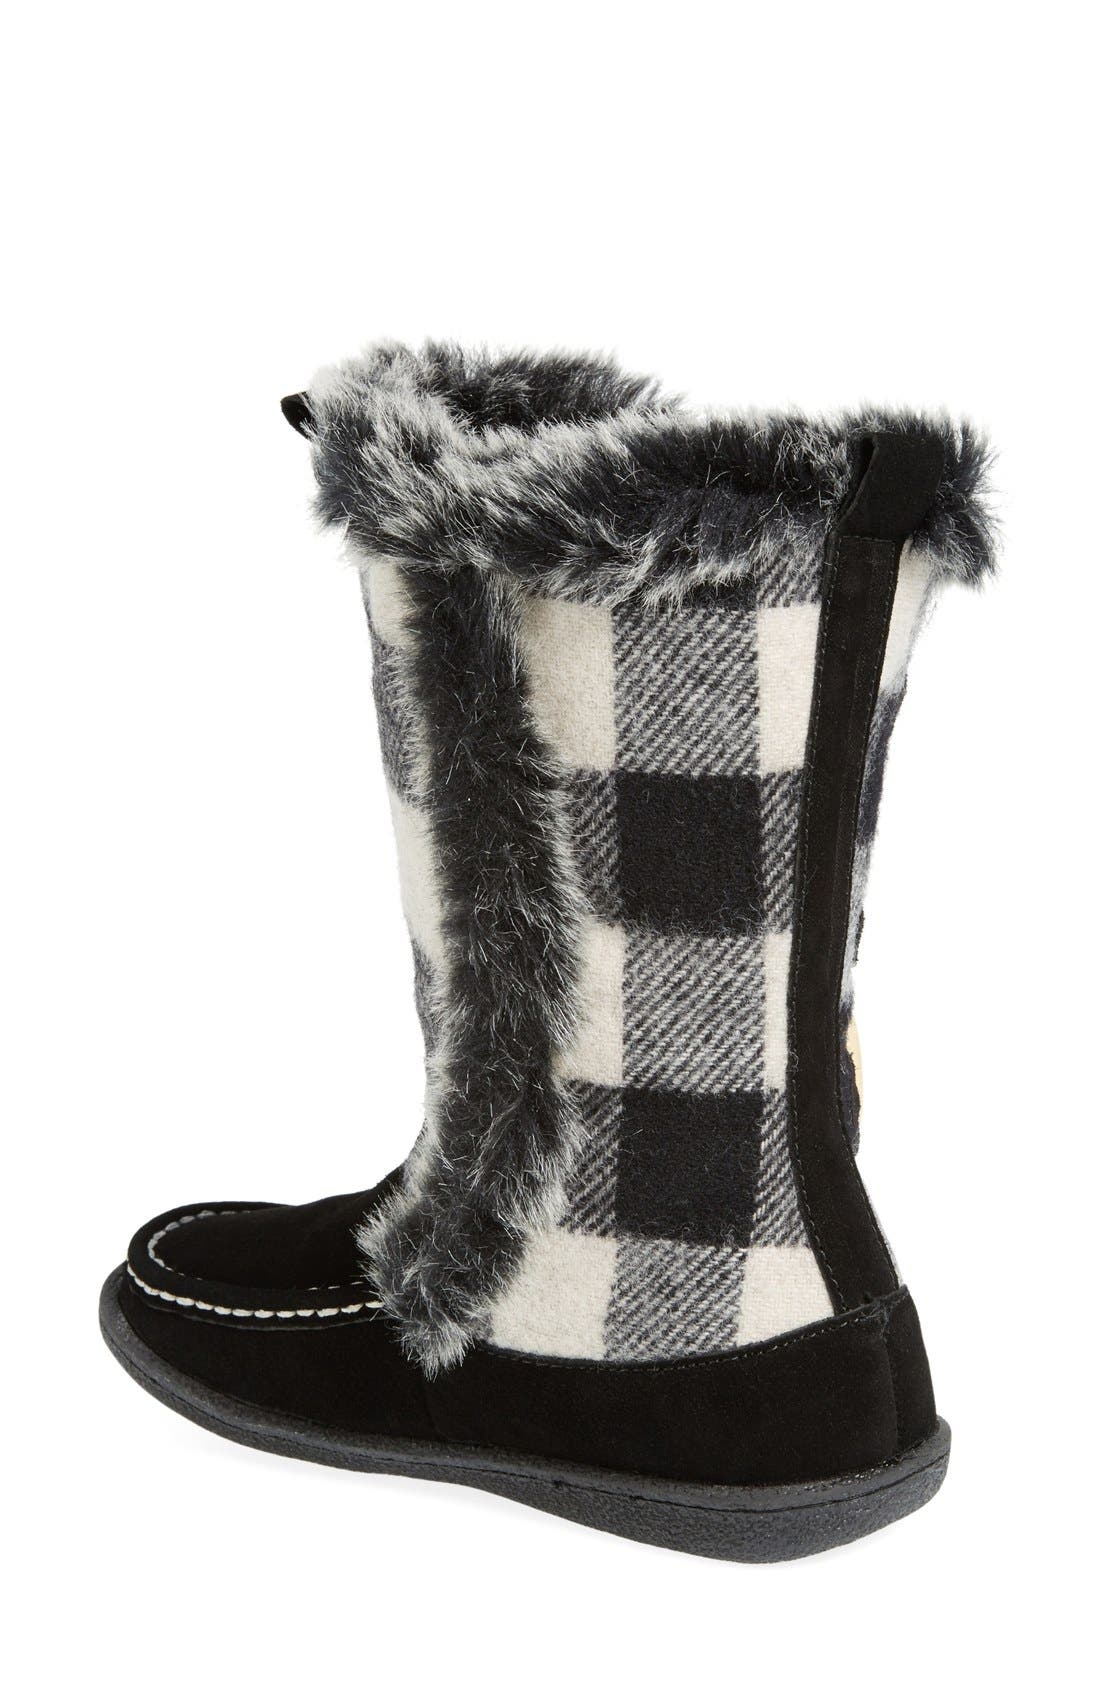 'Elk Creek' Boot,                             Alternate thumbnail 2, color,                             Black/ Buffalo Wool